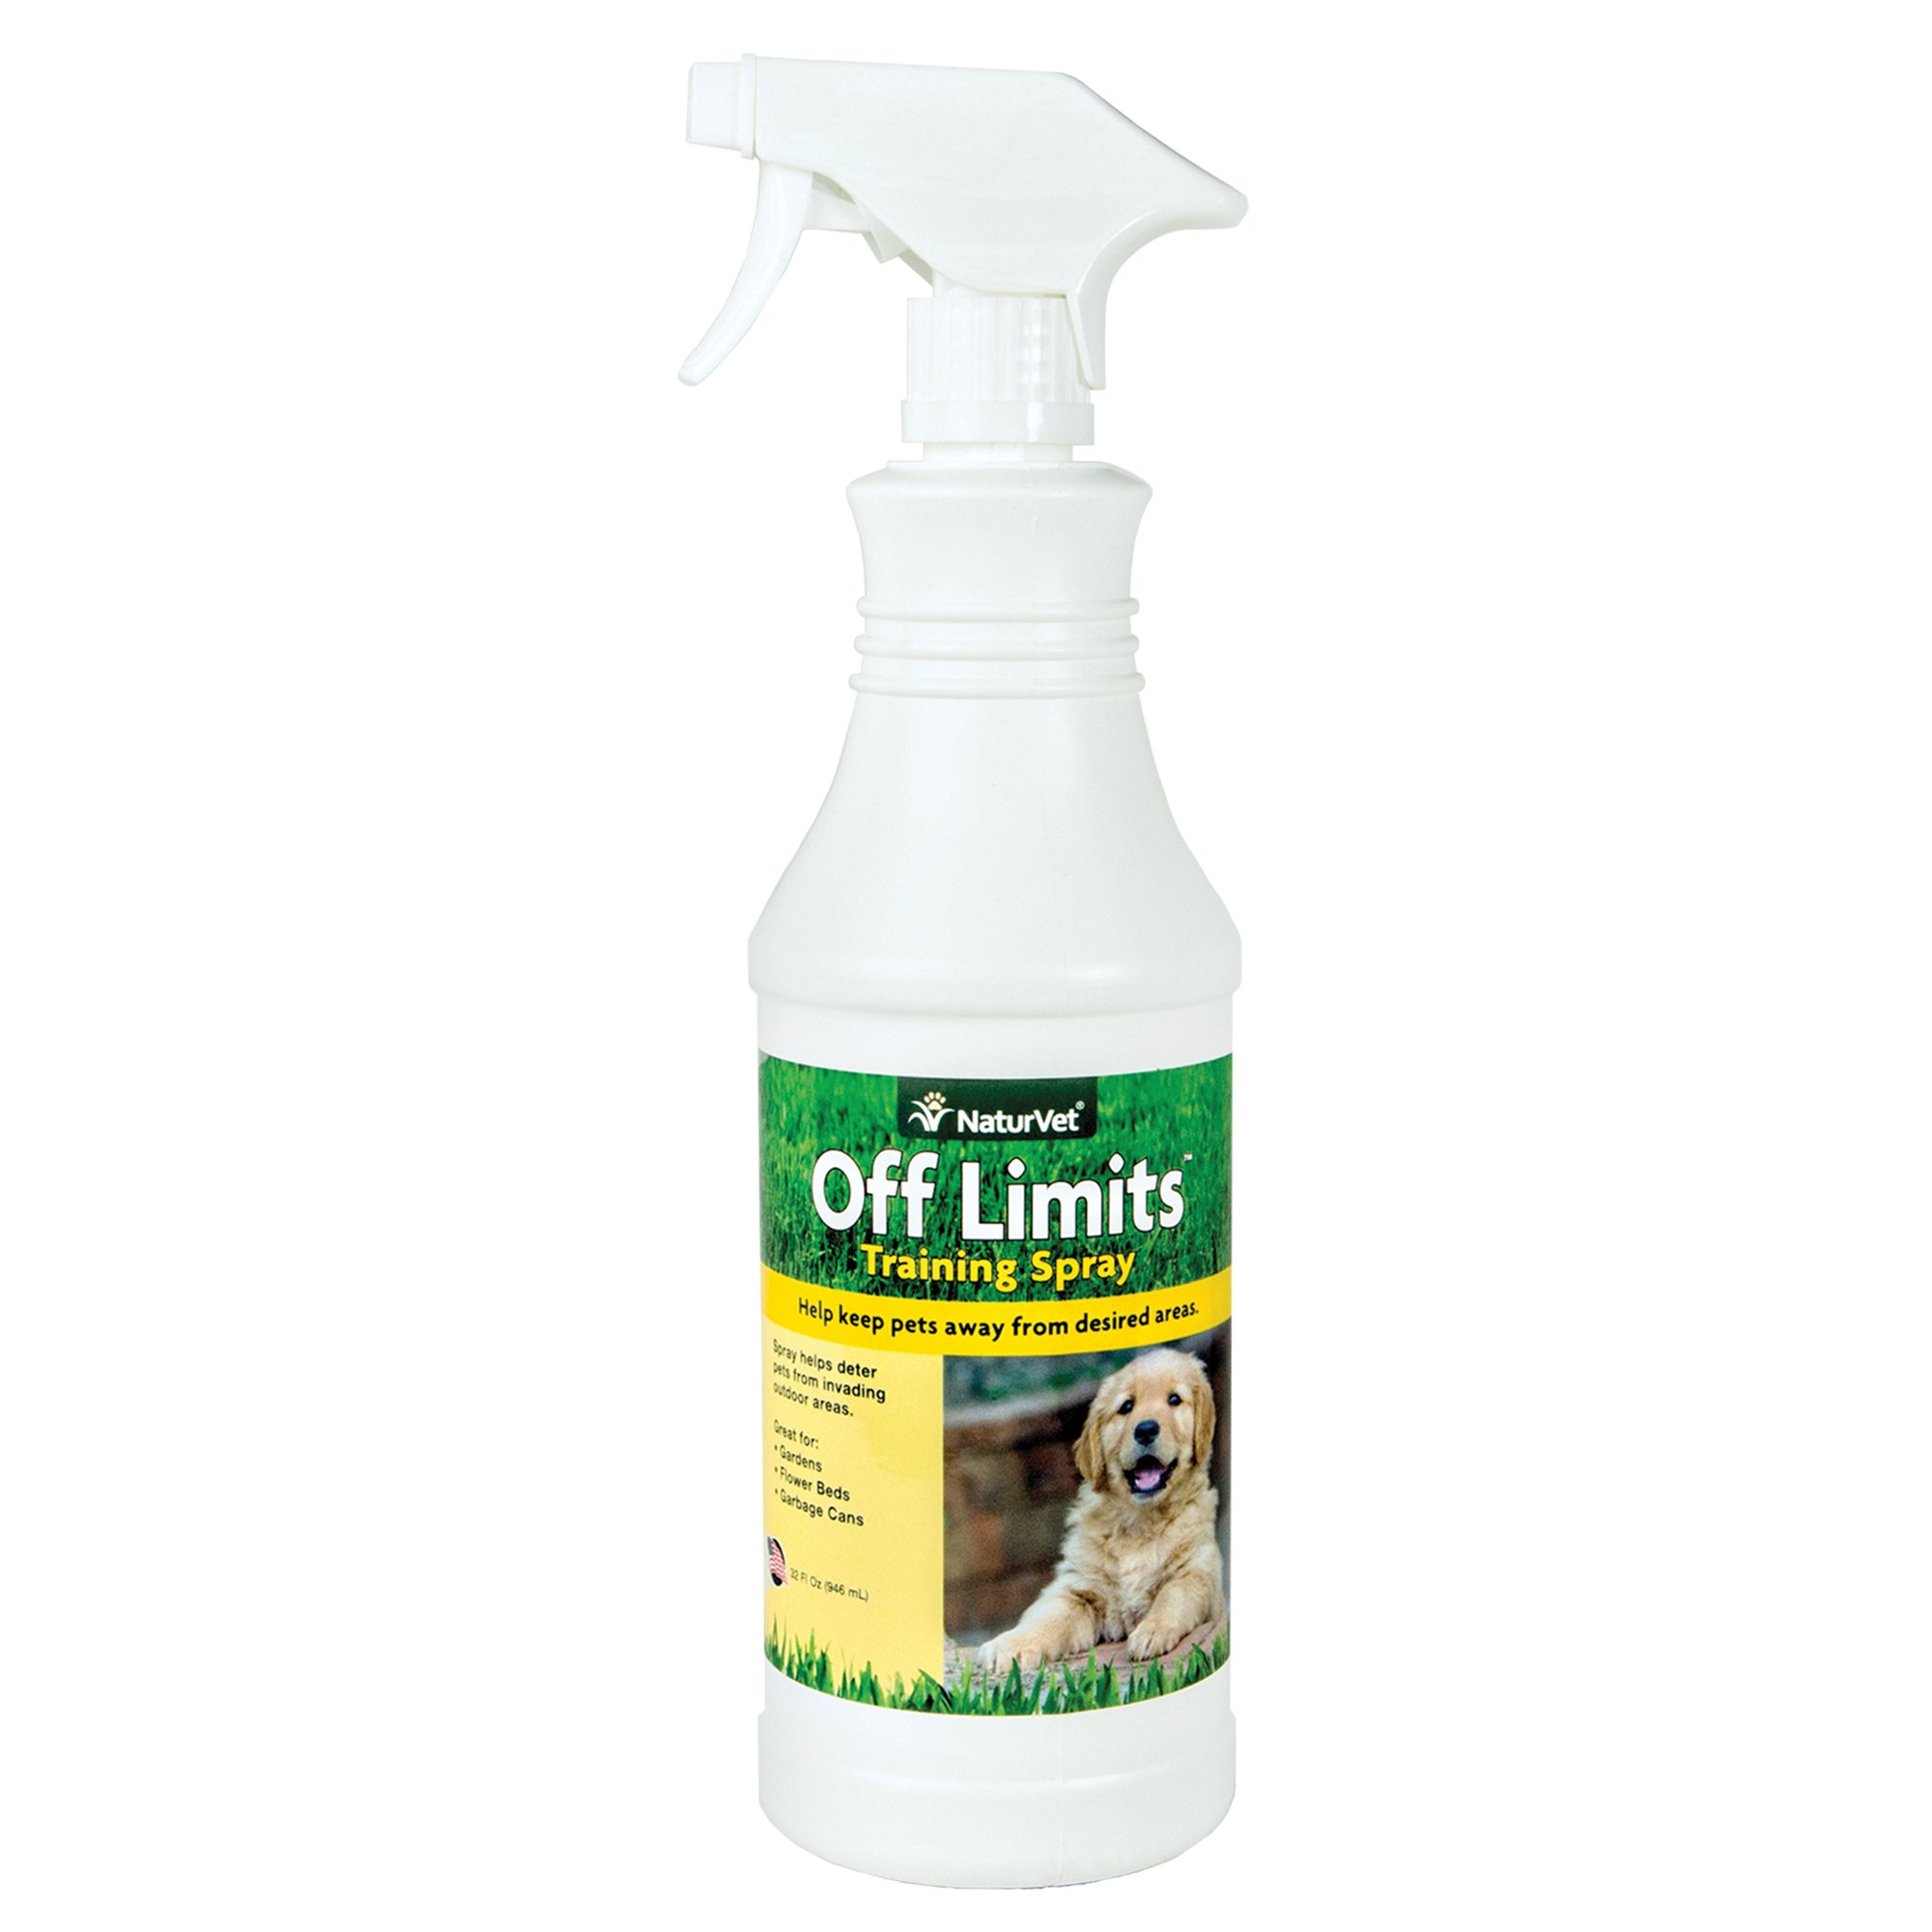 NaturVet Off Limits Dog Training Spray